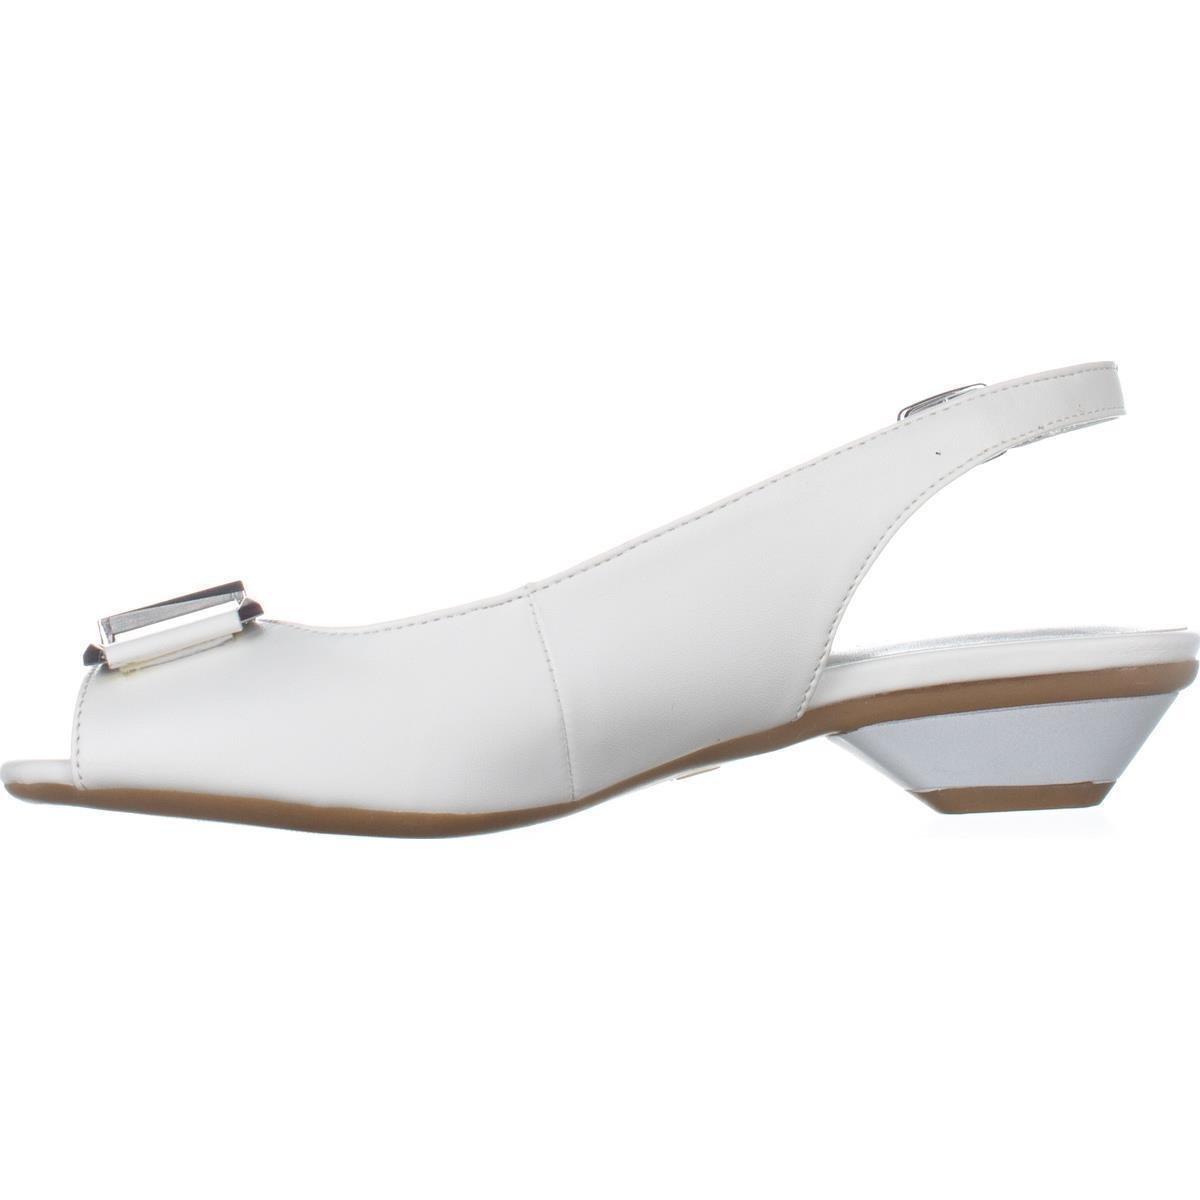 044cecf4682 Karen Scott KS35 Inga Peep Toe Kitten Heels - White